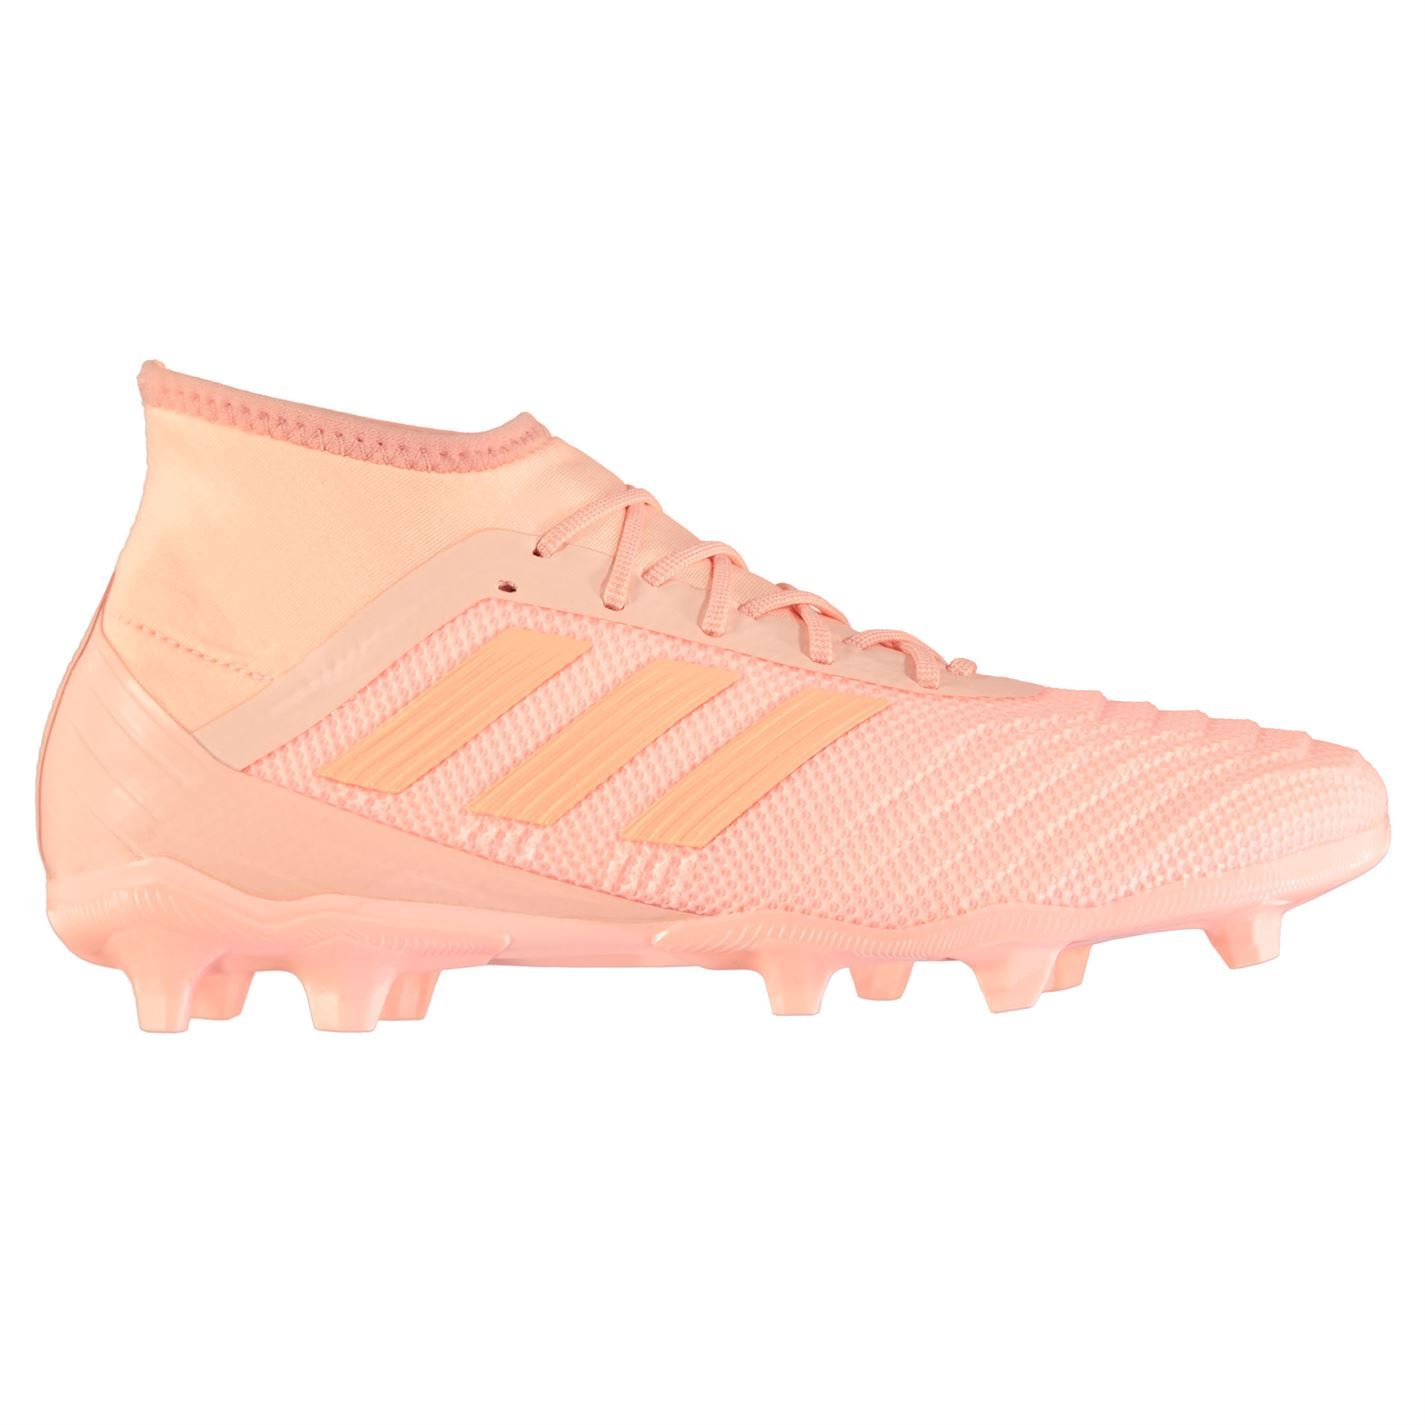 Adidas-Predator-18-2-FG-Firm-Ground-Chaussures-De-Football-Homme-Football-Chaussures-Crampons miniature 4